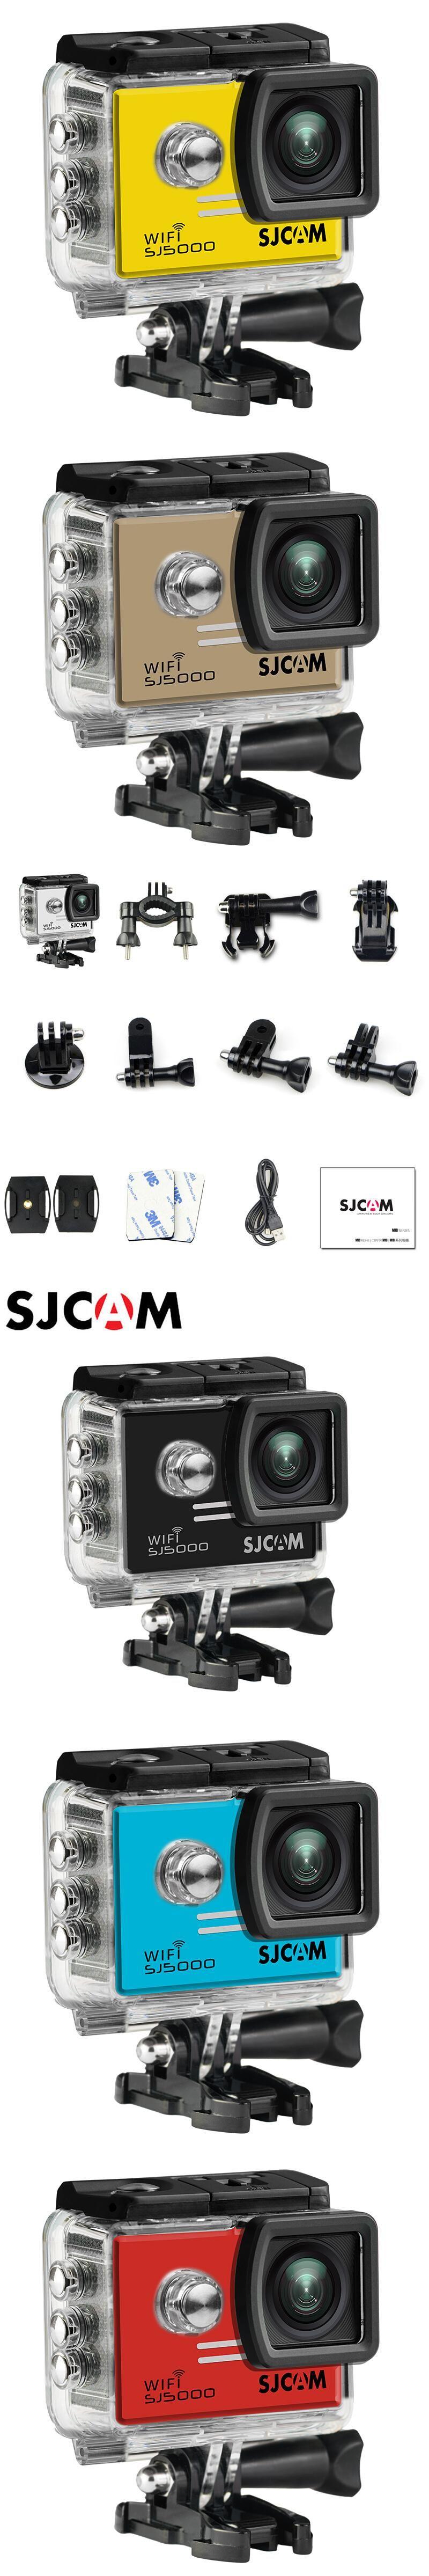 Sjcam Sj5000 Wifi Action Camera Sports Dv Hd 1080p 30m Waterproof Sportcam Non Cam Gopro Original Sj 5000 Sport